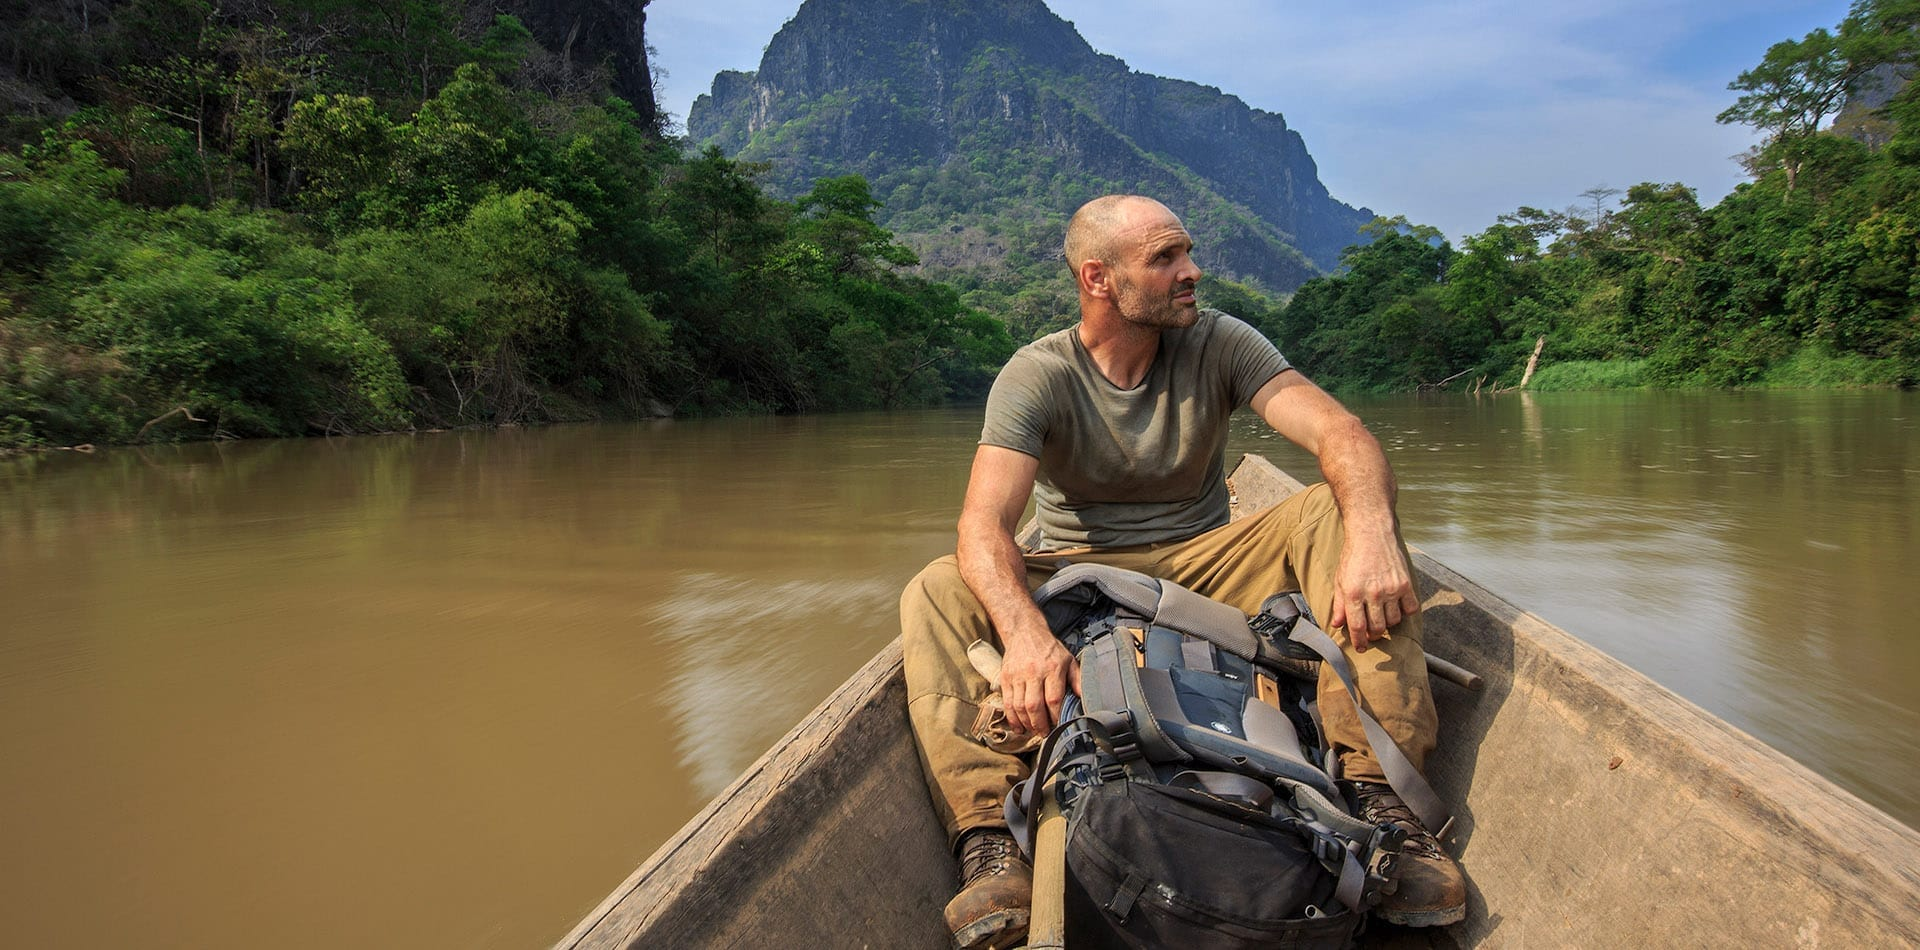 Ed Stafford cruising down a river in Laos